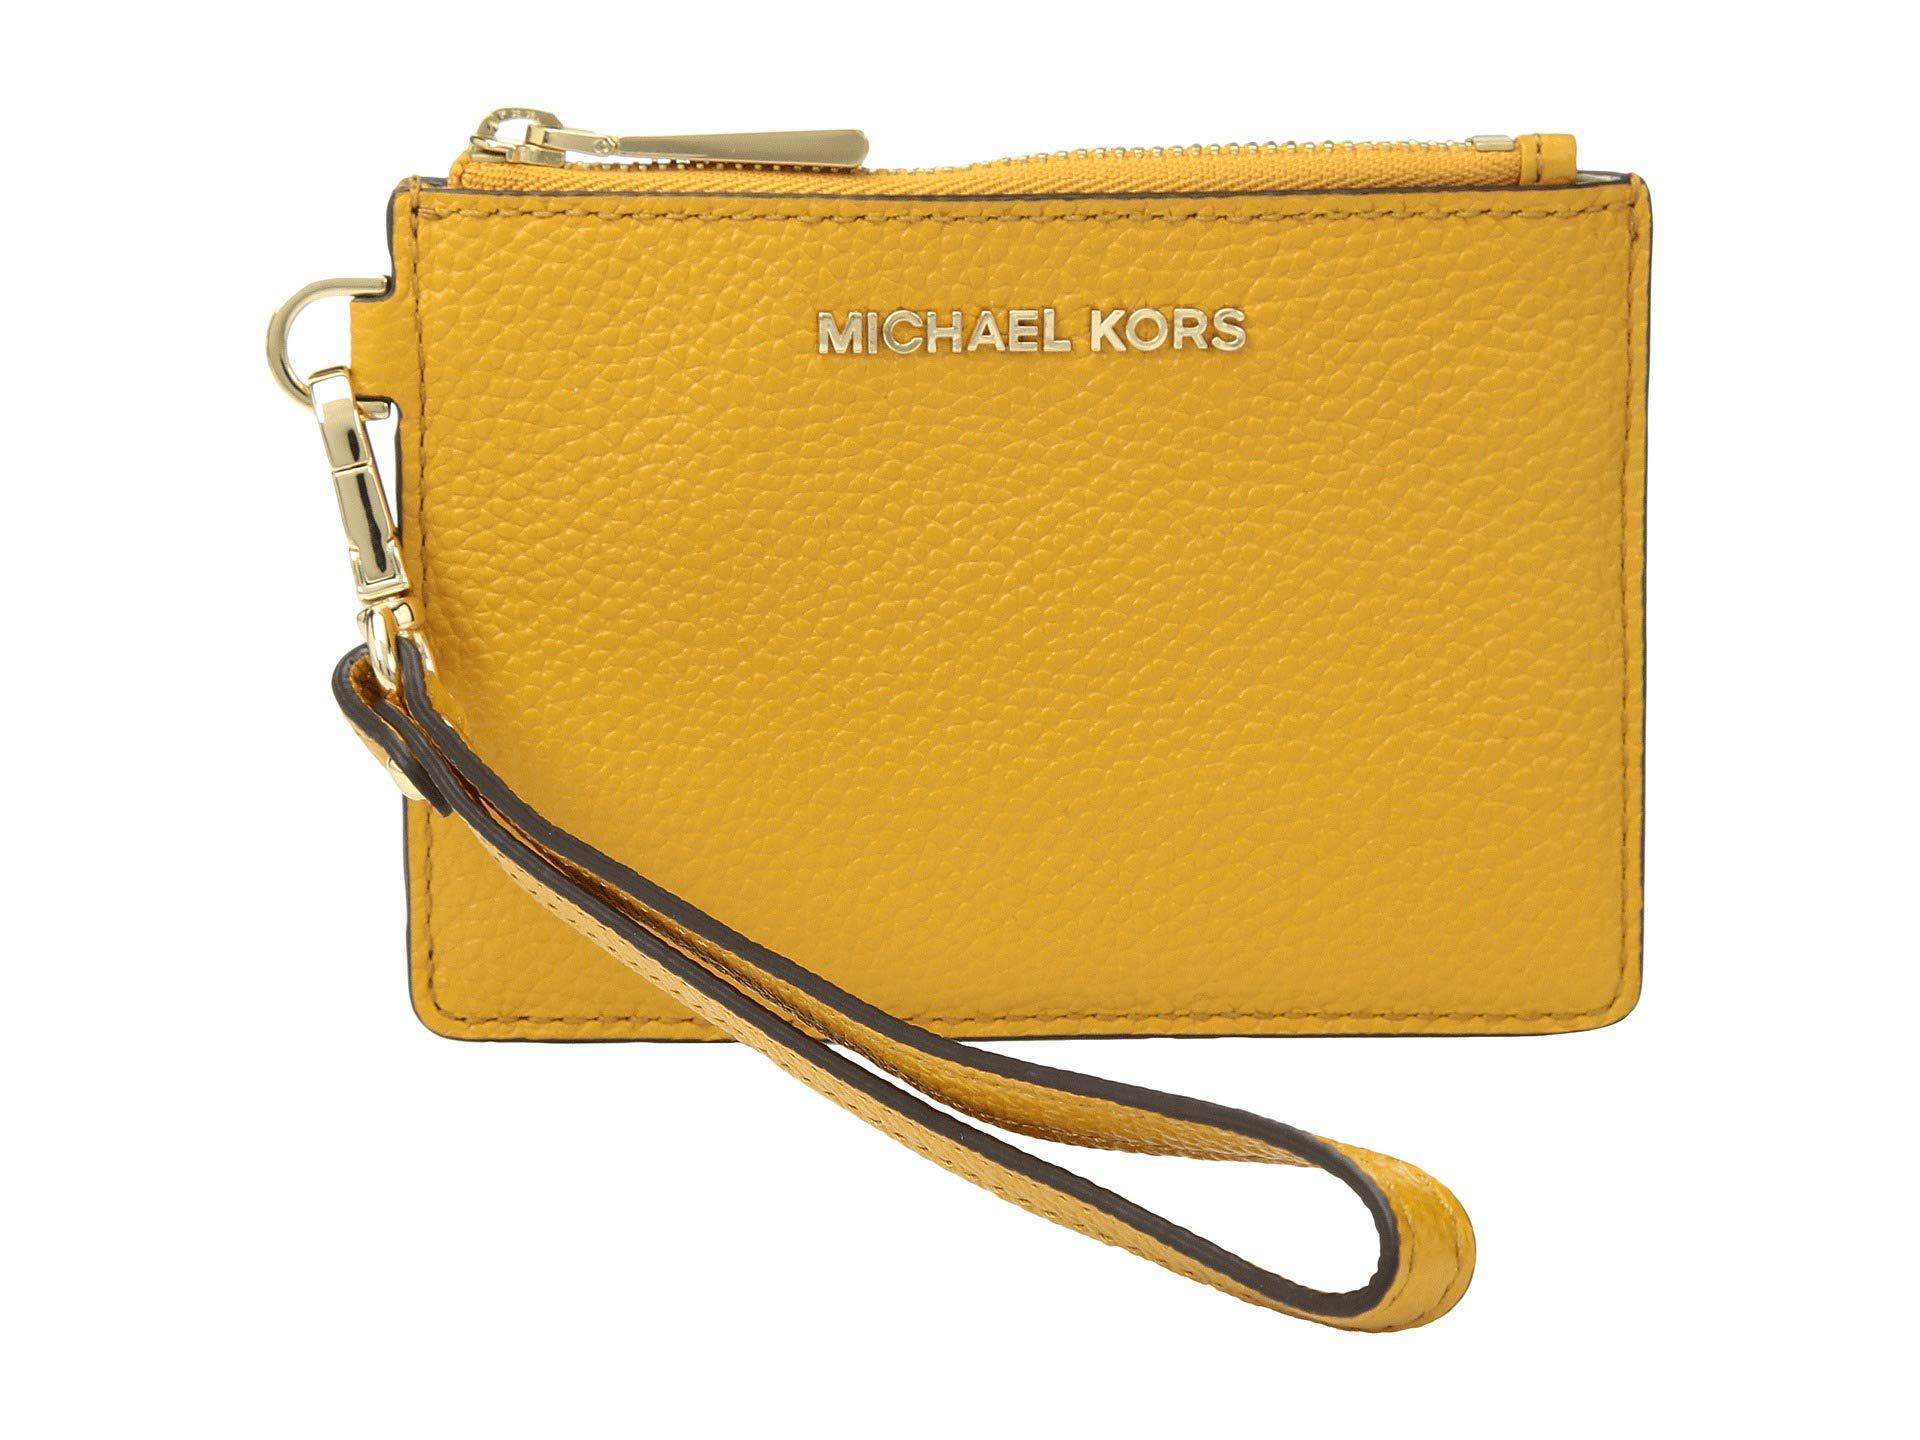 68c8aa9f654e MICHAEL Michael Kors Small Coin Purse (marigold) Coin Purse in ...